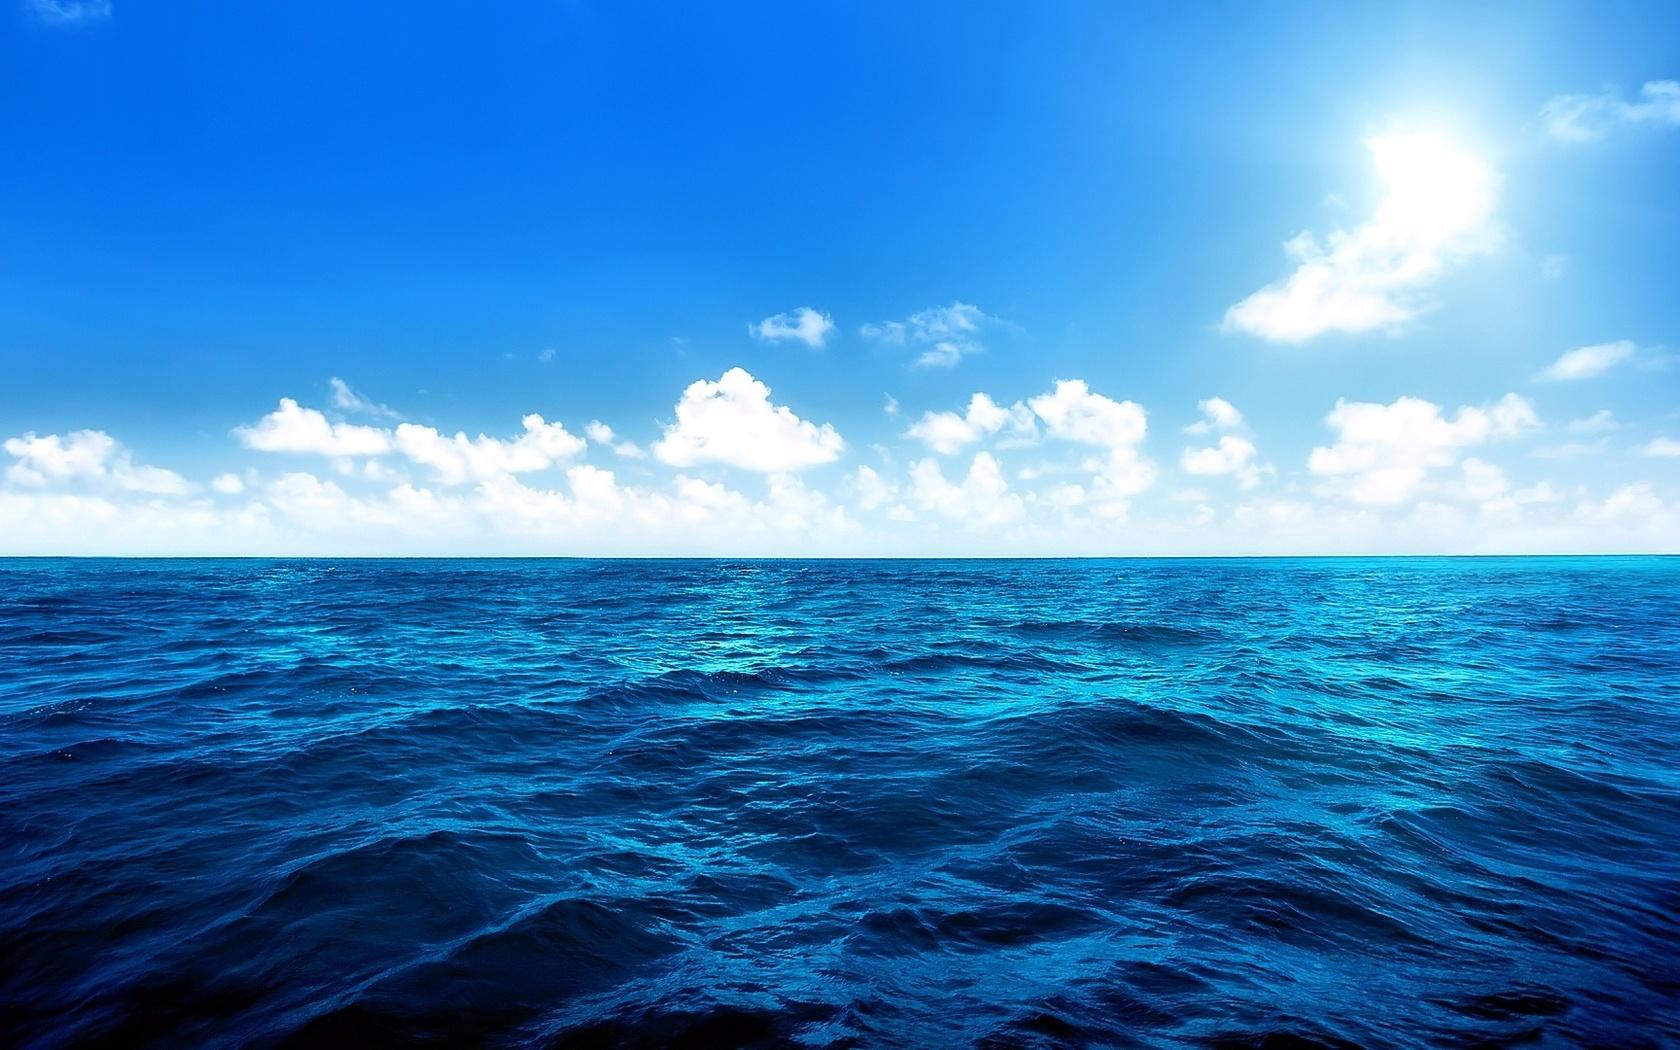 вода океан картинки для нами